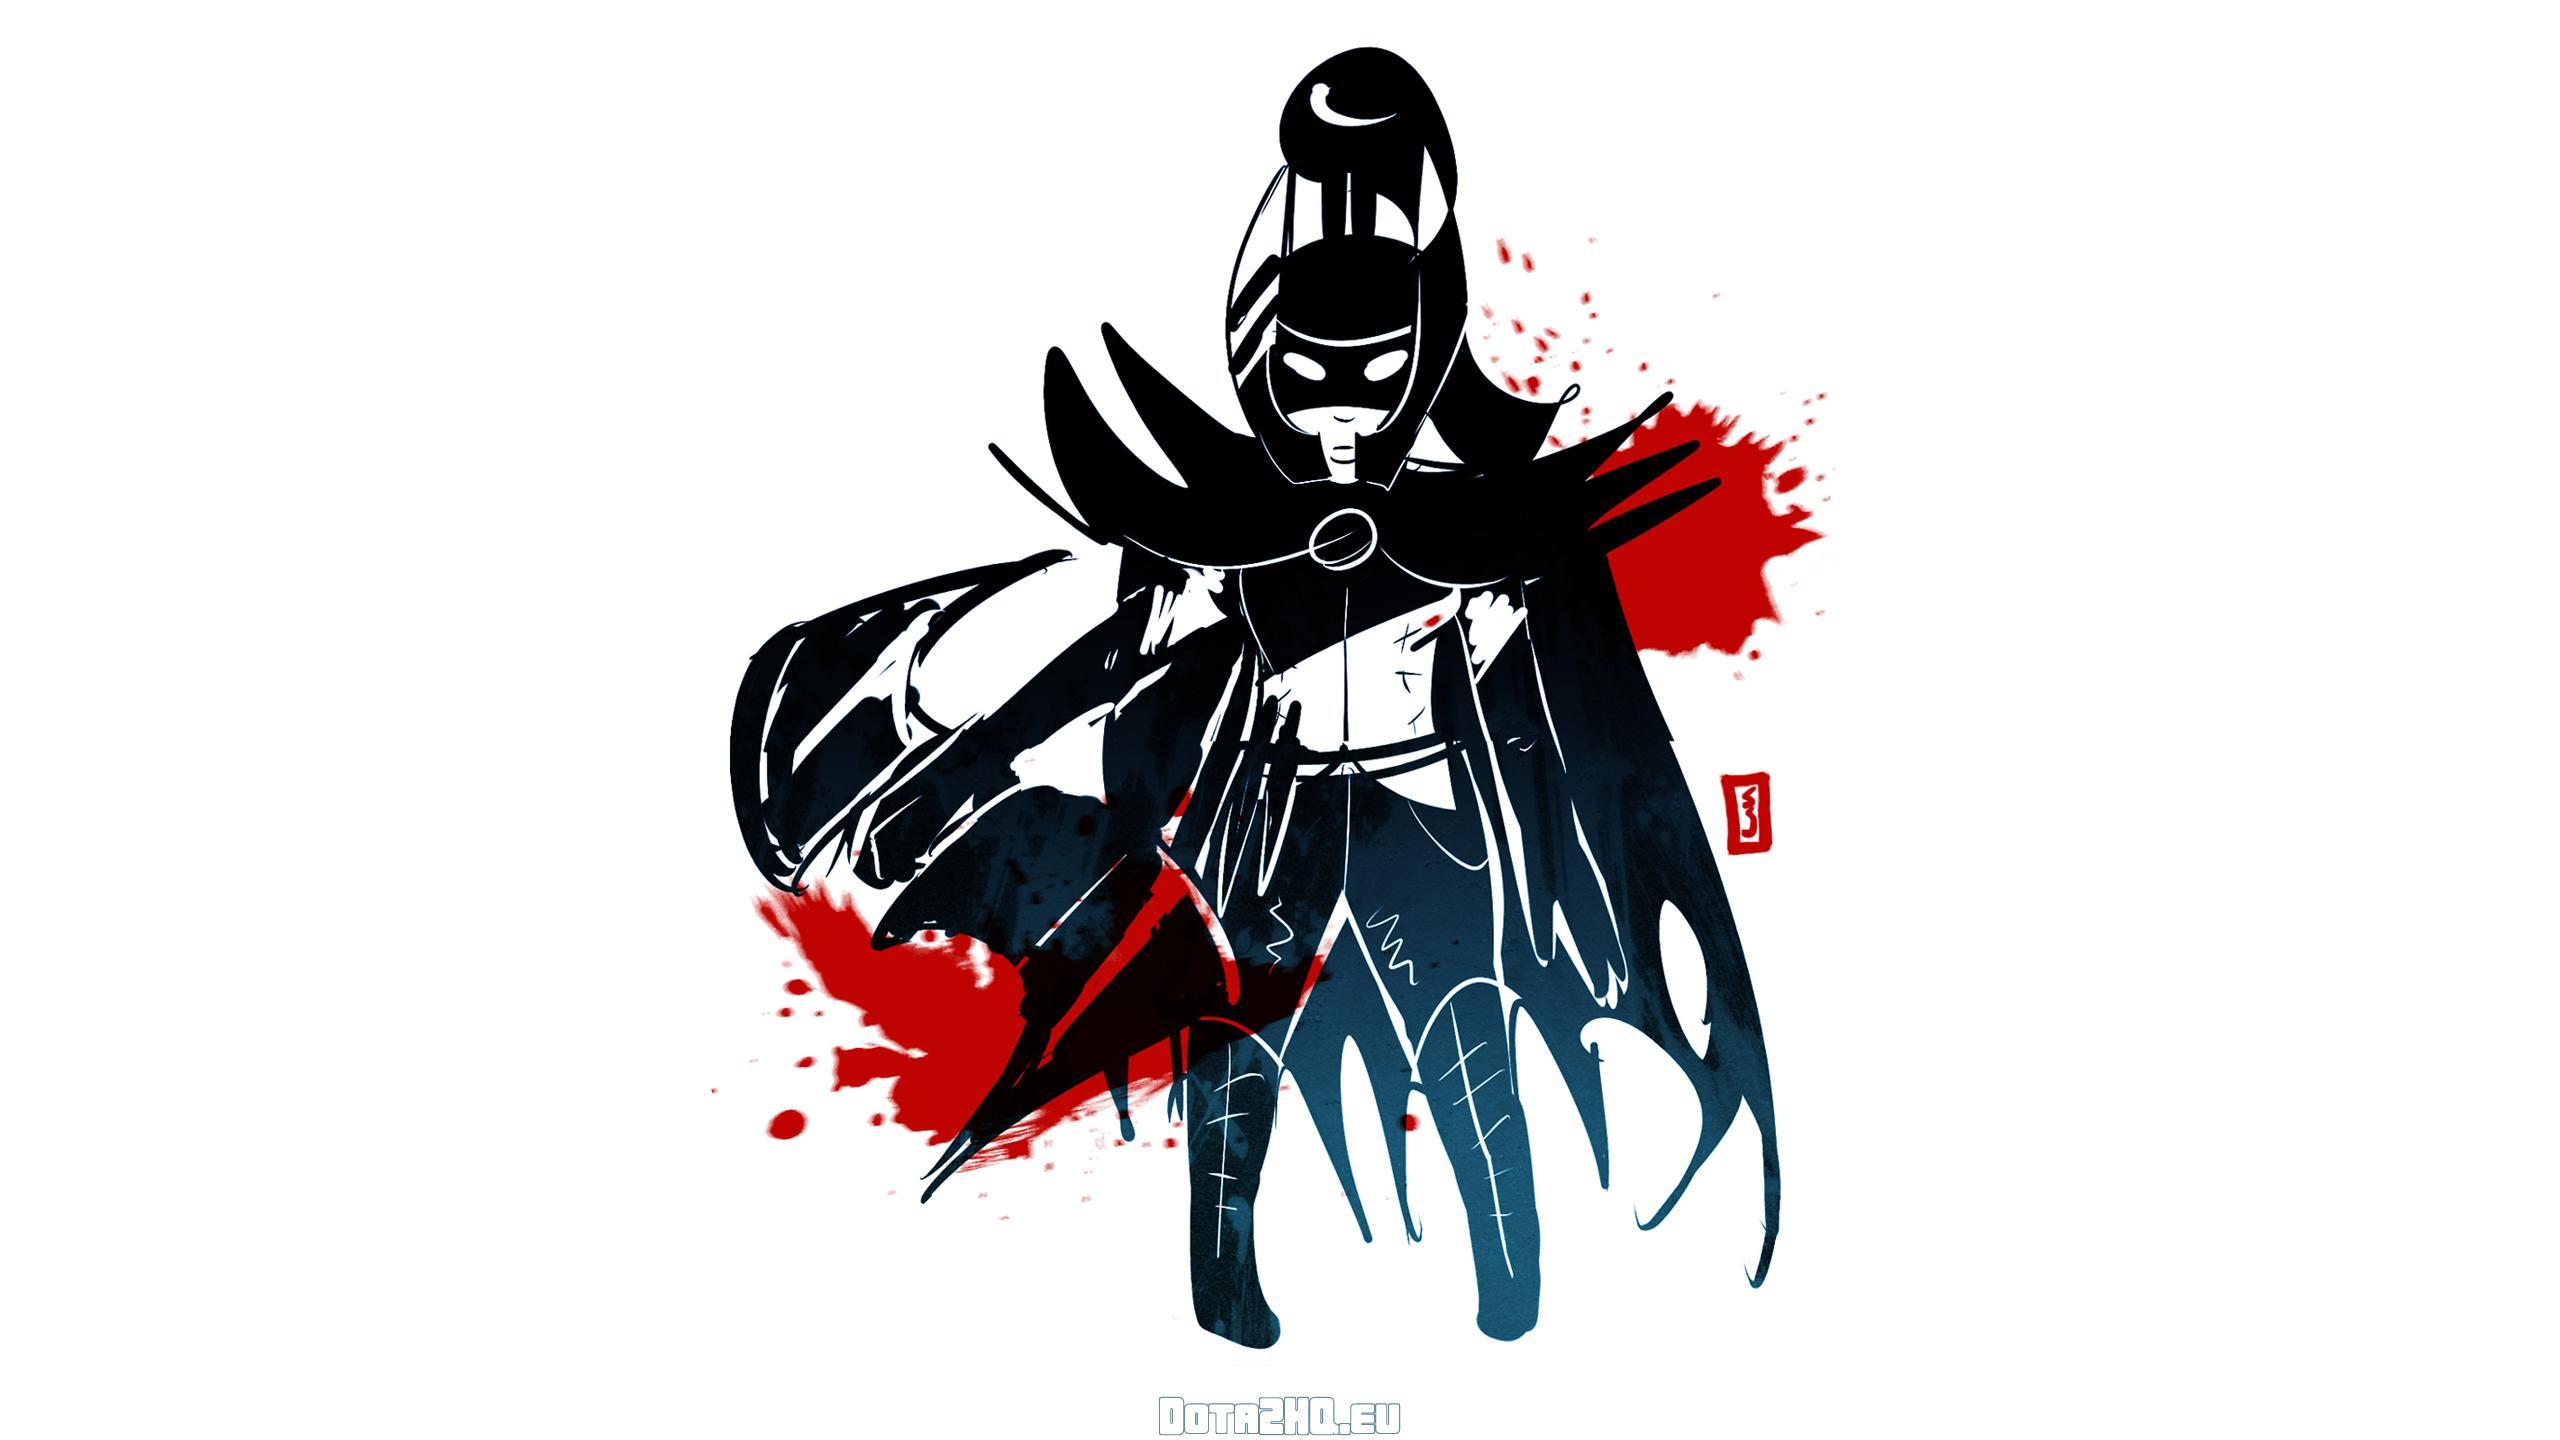 Phantom Assassin, Dota 2, Simple Art - Dota 2 All Heroes Wallpaper Hd , HD Wallpaper & Backgrounds